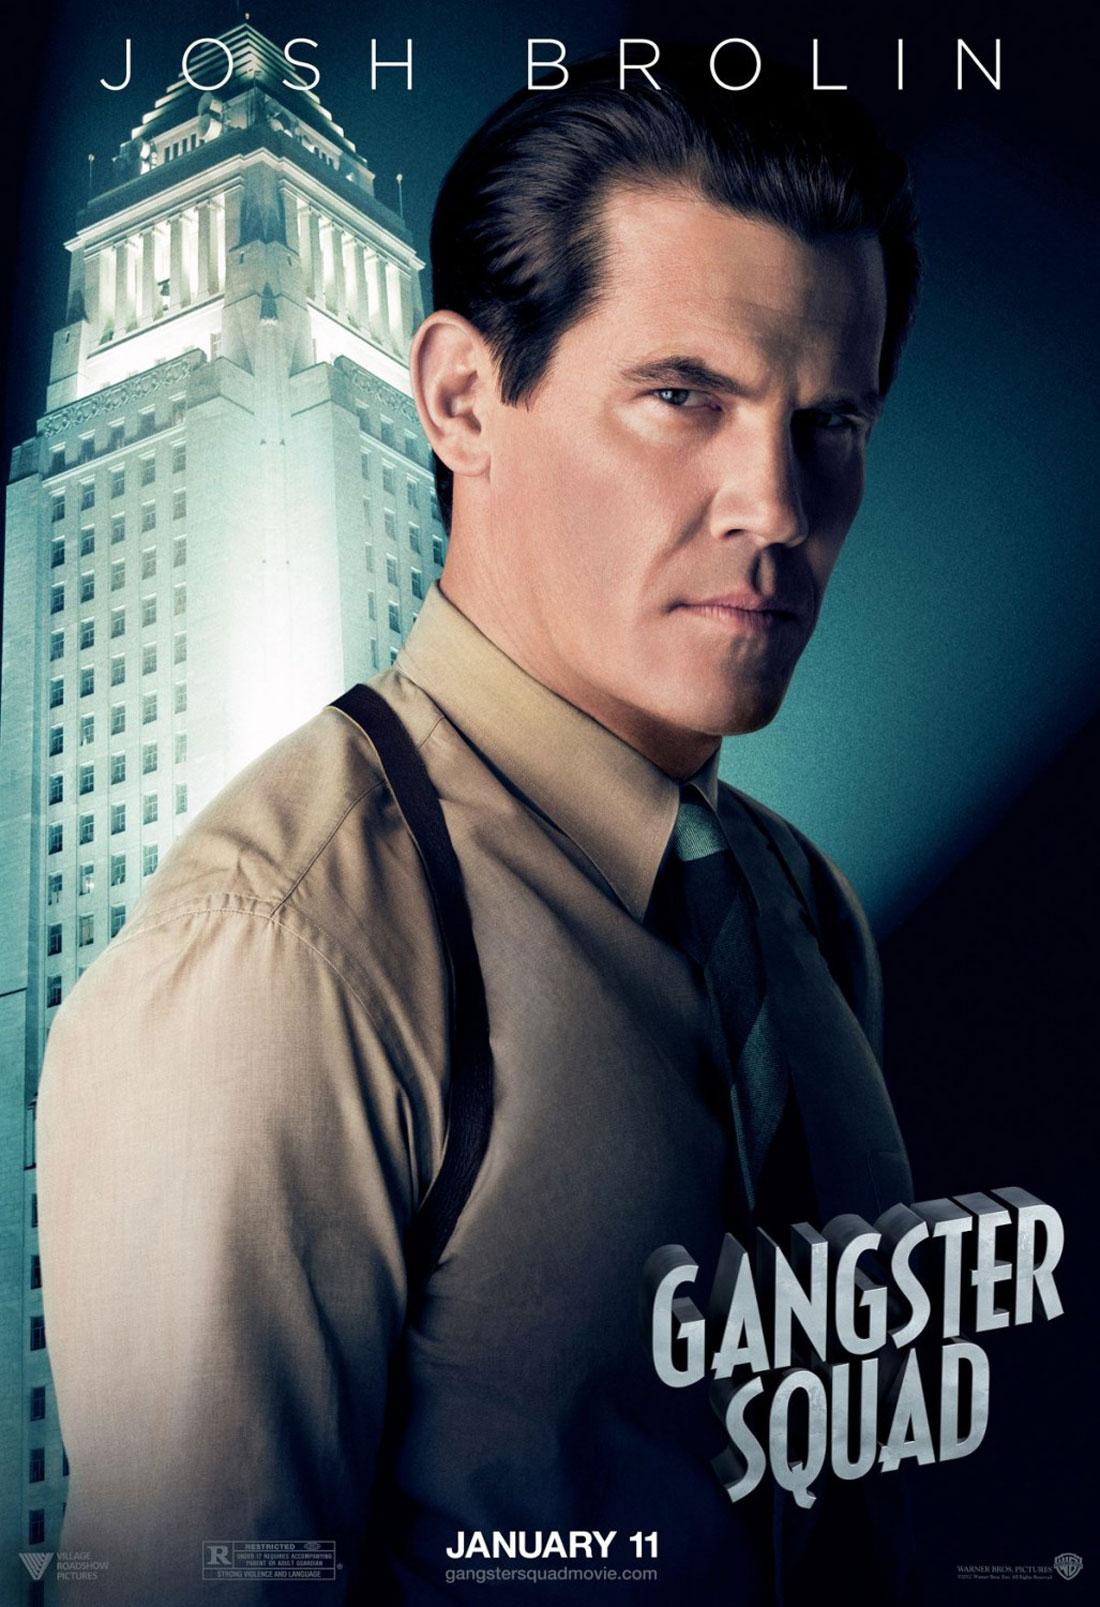 Gangster Squad - Movie Poster #7 (Original)